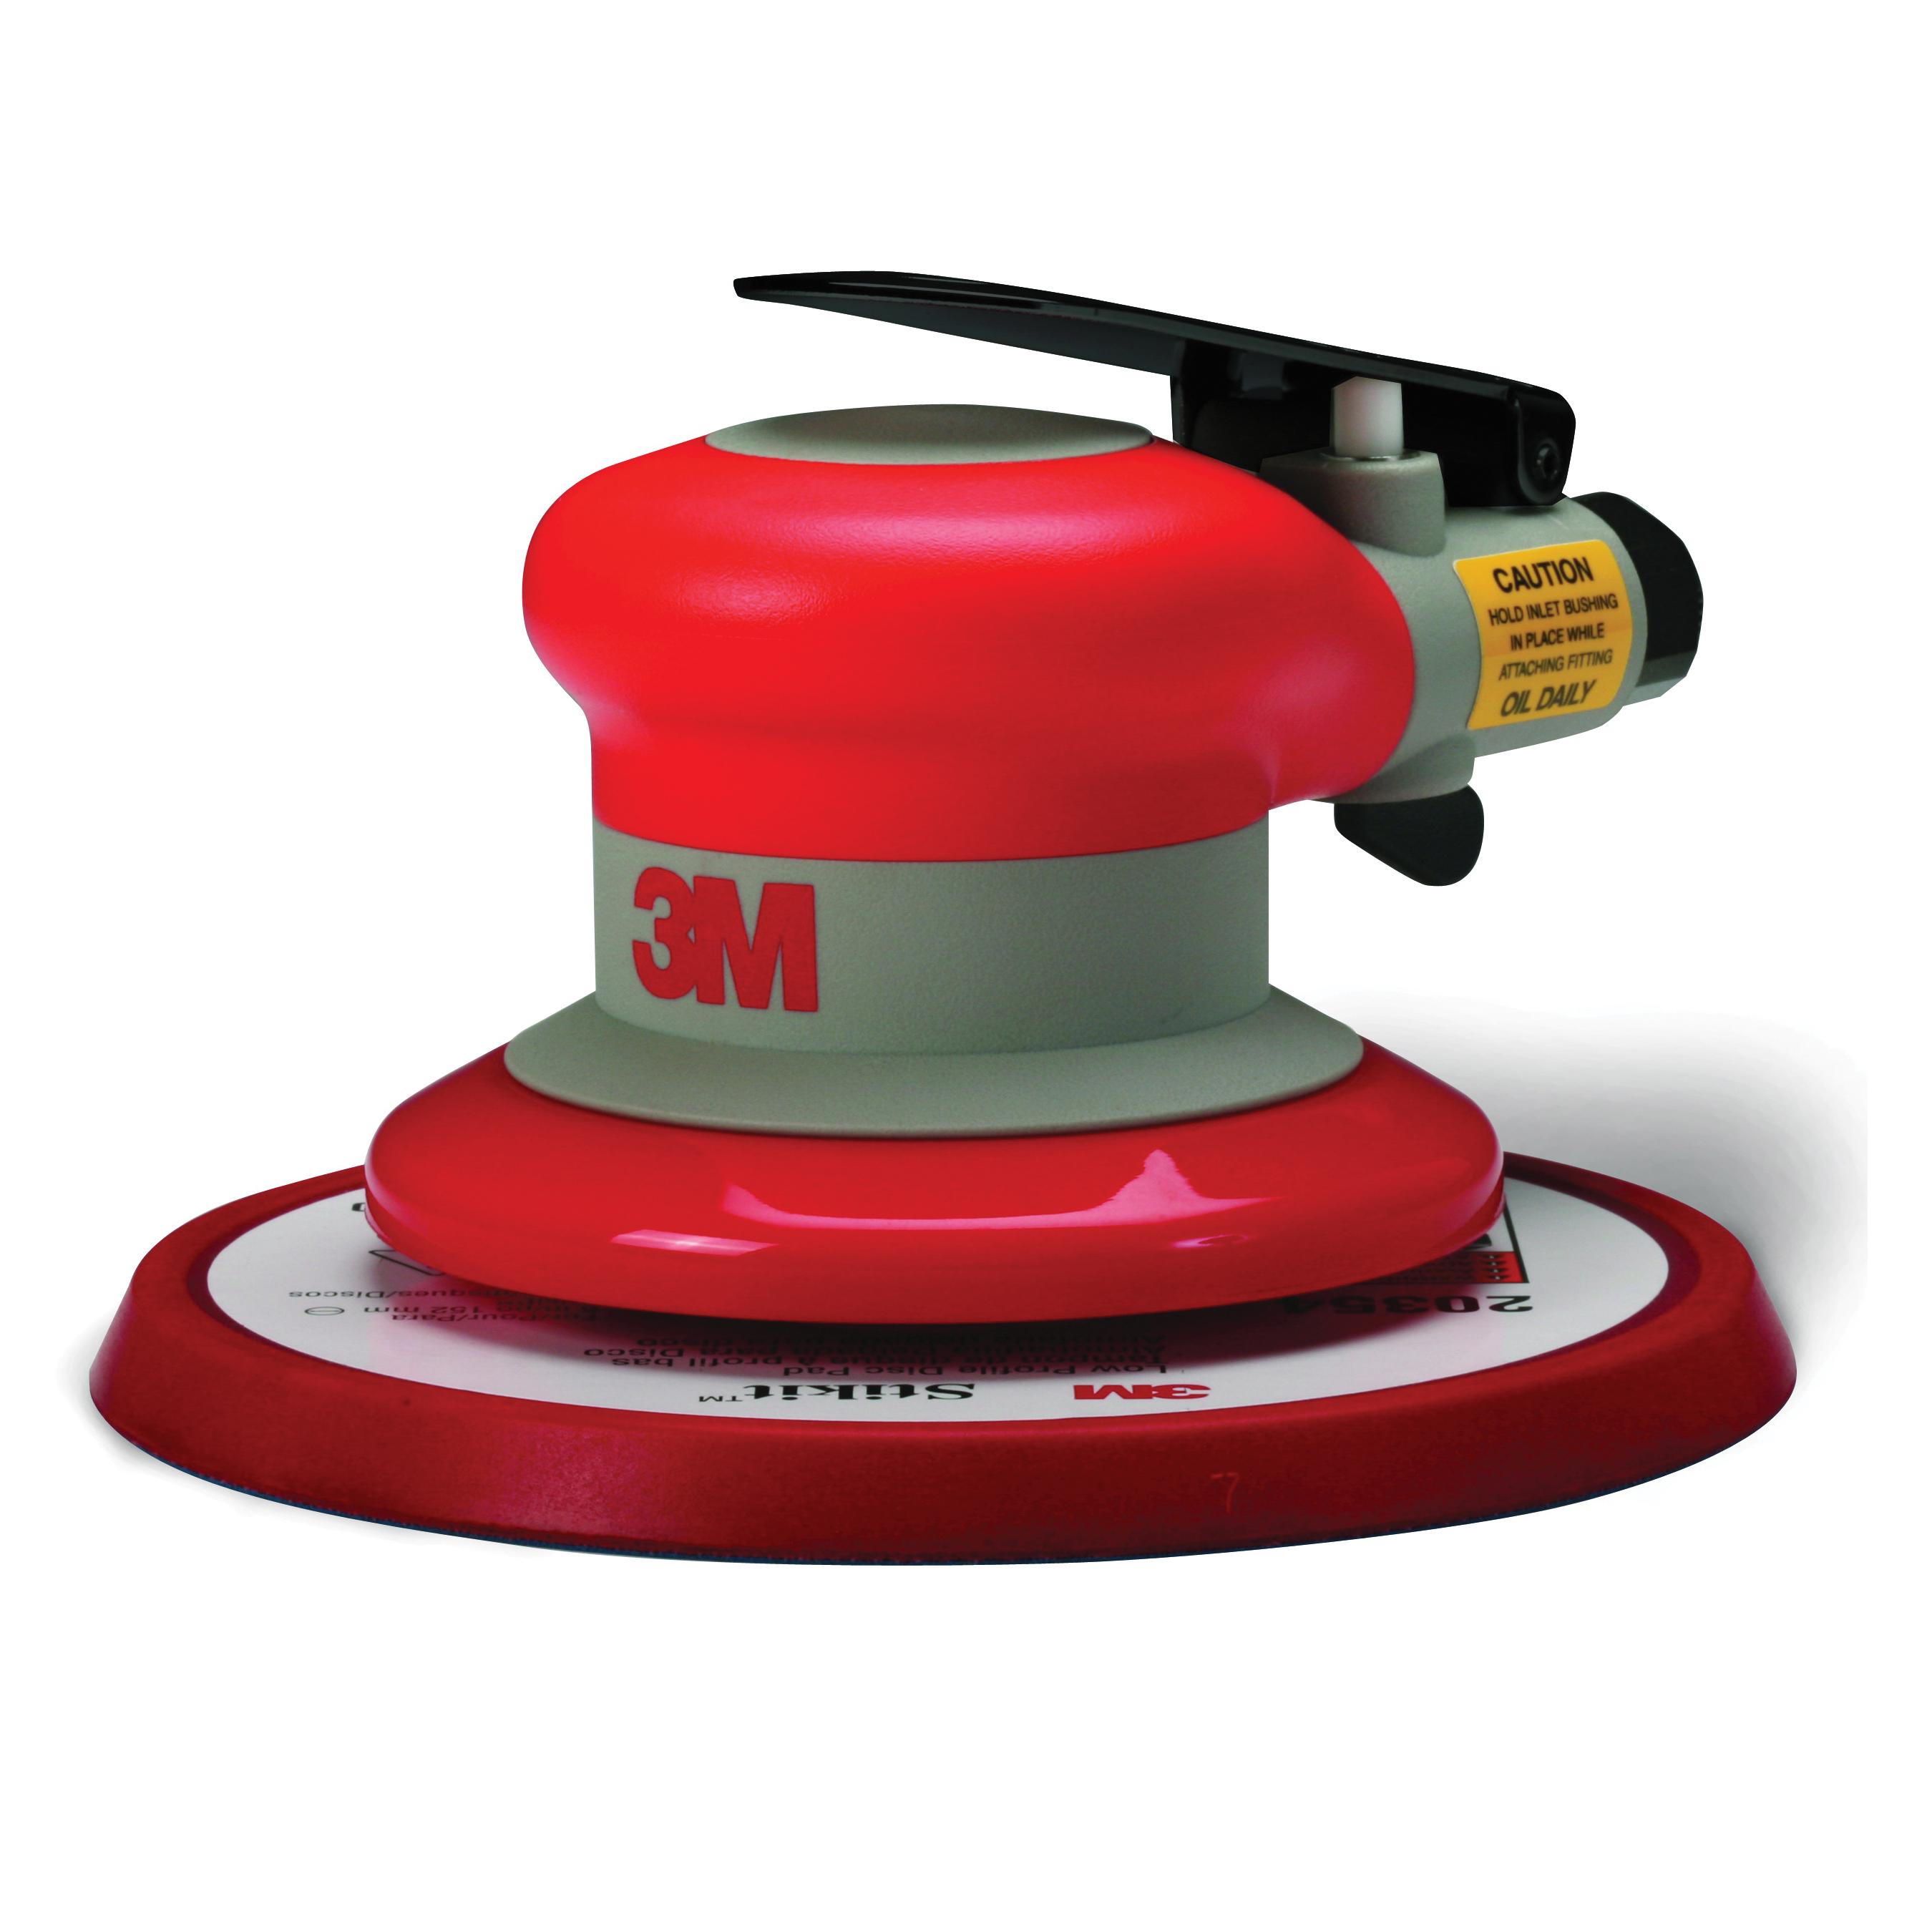 3M™ 051141-20319 Self-Generated Vacuum Pneumatic Random Orbital Sander, 5 in Pad, 17 scfm Air Flow